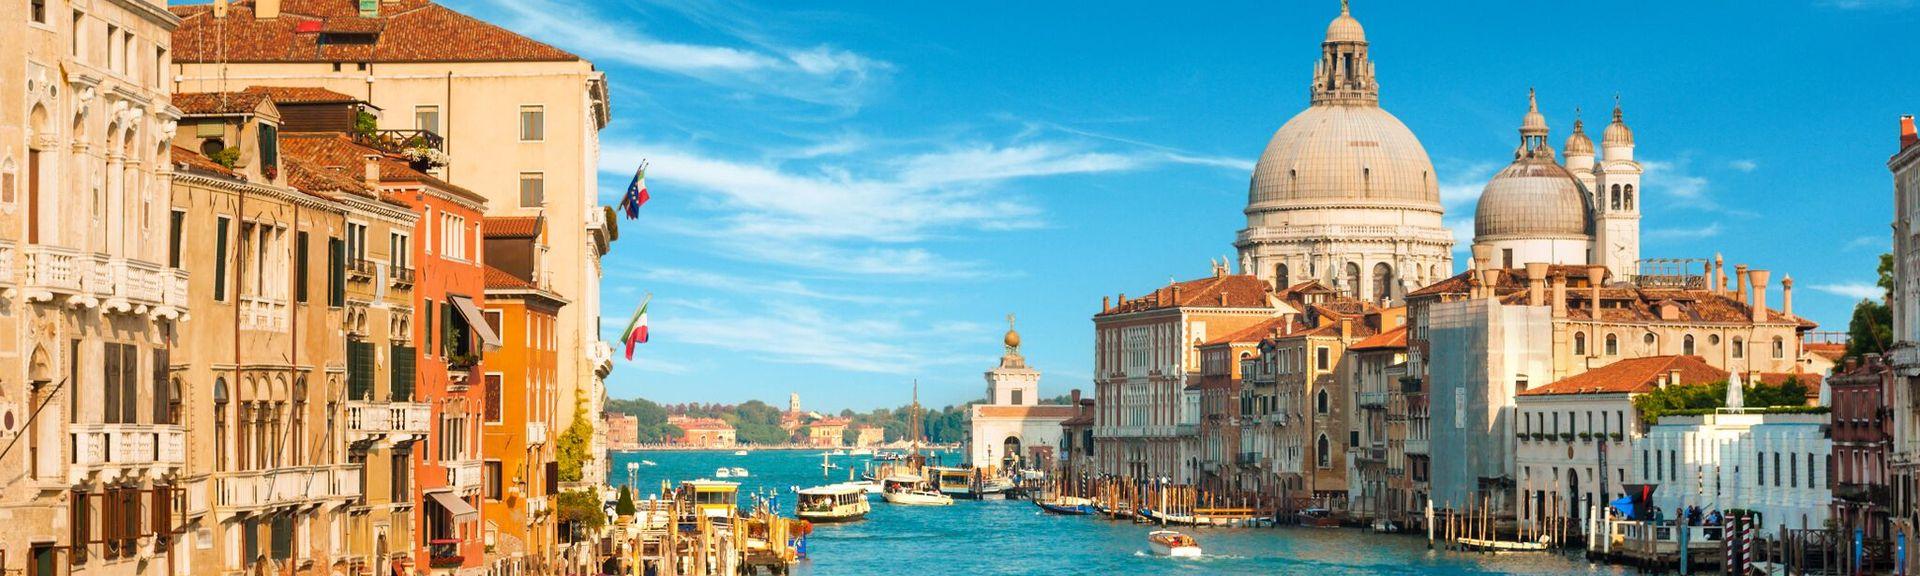 Venetsia, Venetsia, Veneto, Italia